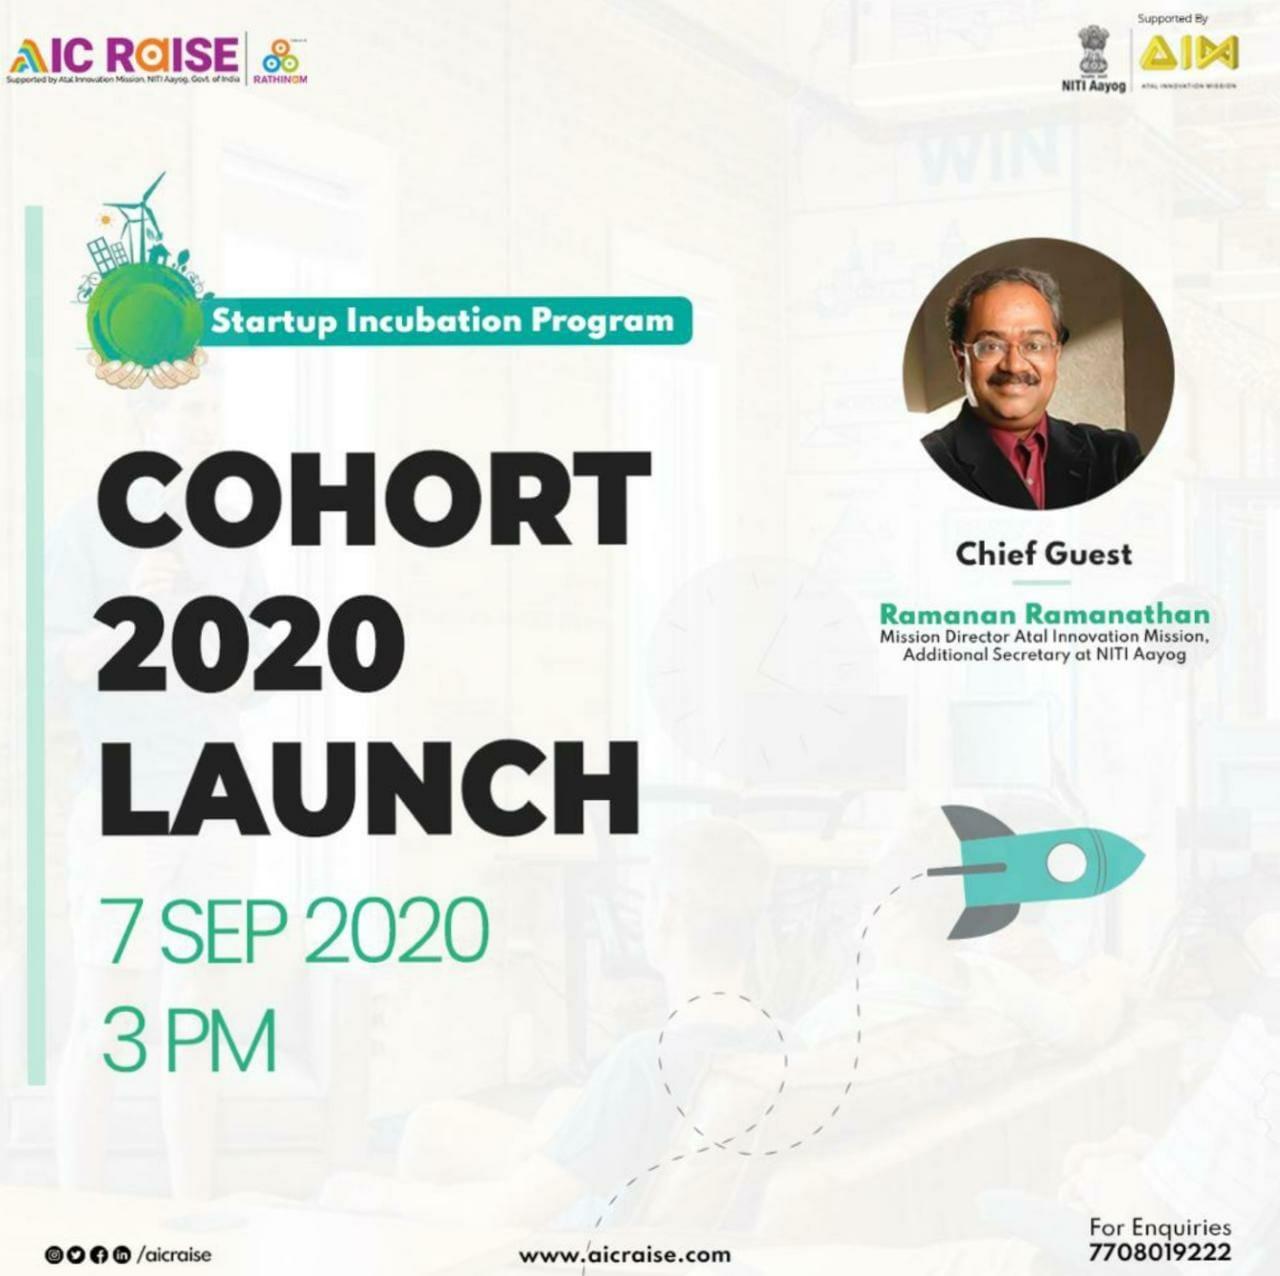 COHORT 2020